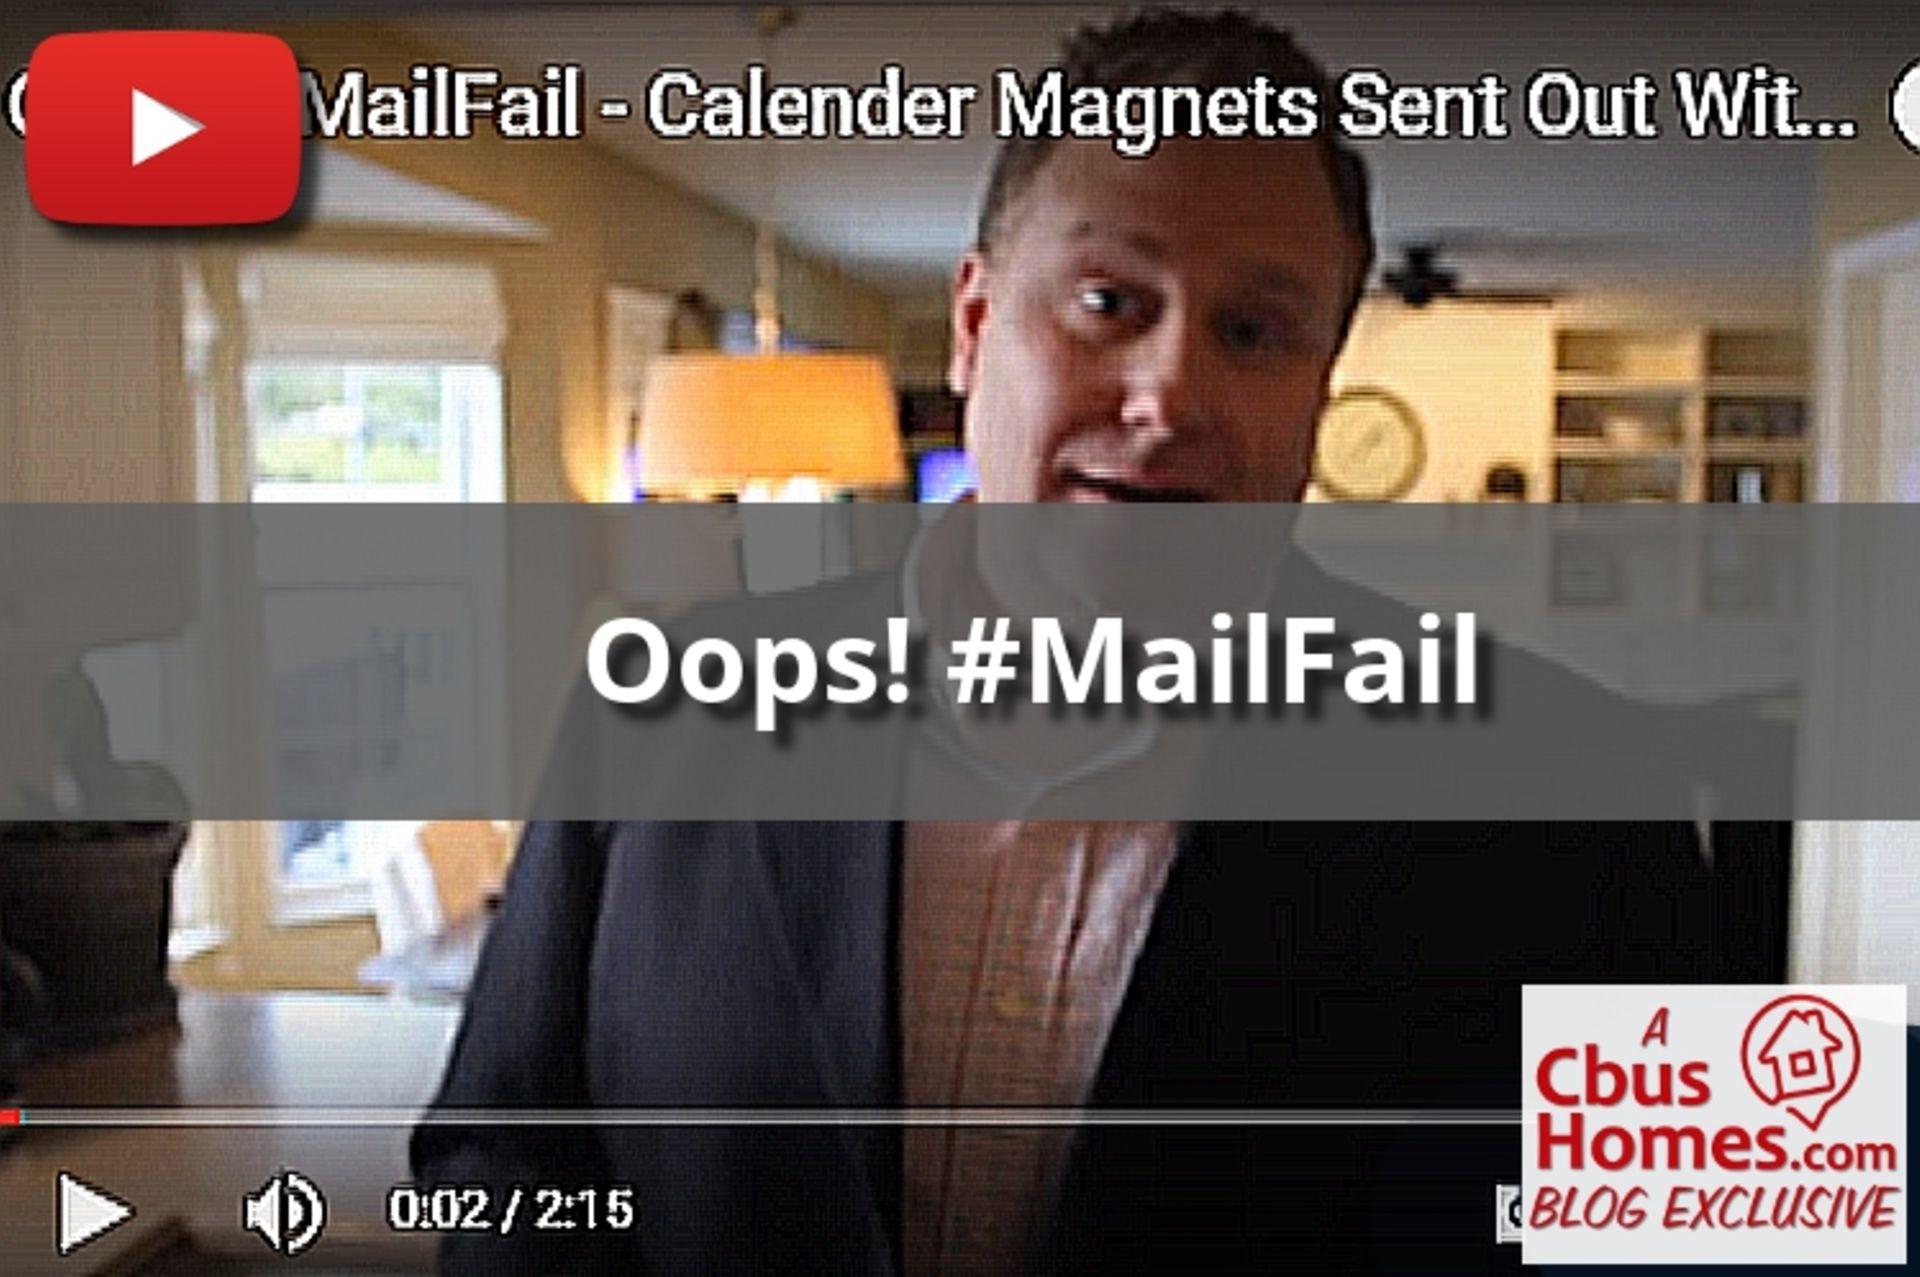 #MailFail: Calendar Magnet Printing Error